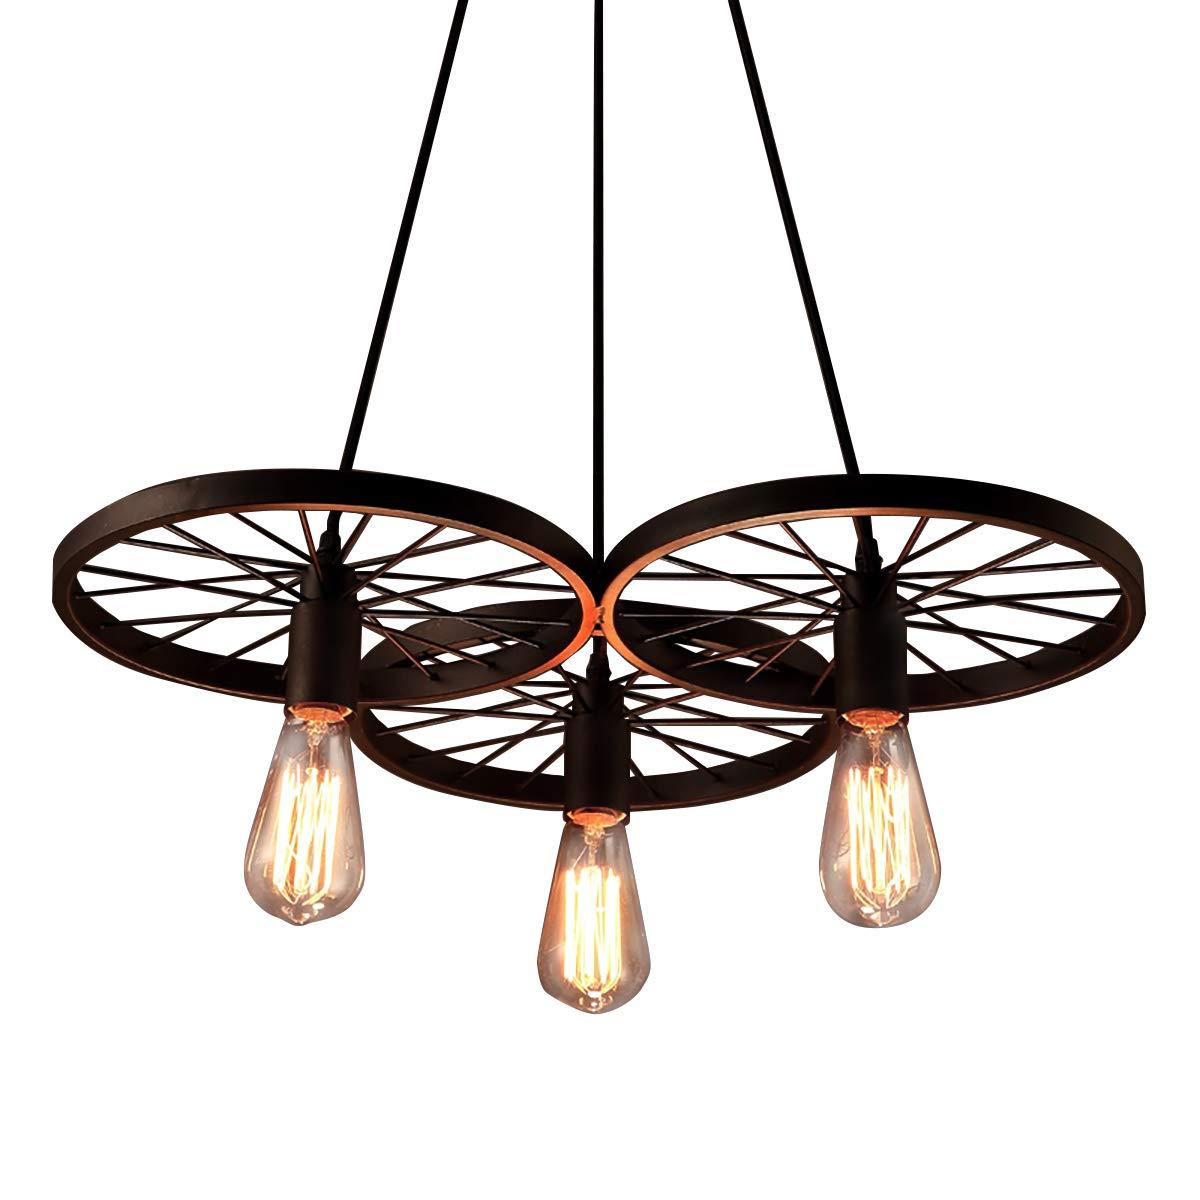 Electro_BP Antique Metal Art Large Barn Wheels Hanging Pendant Light Max 180W With 3 Lights Black Finish